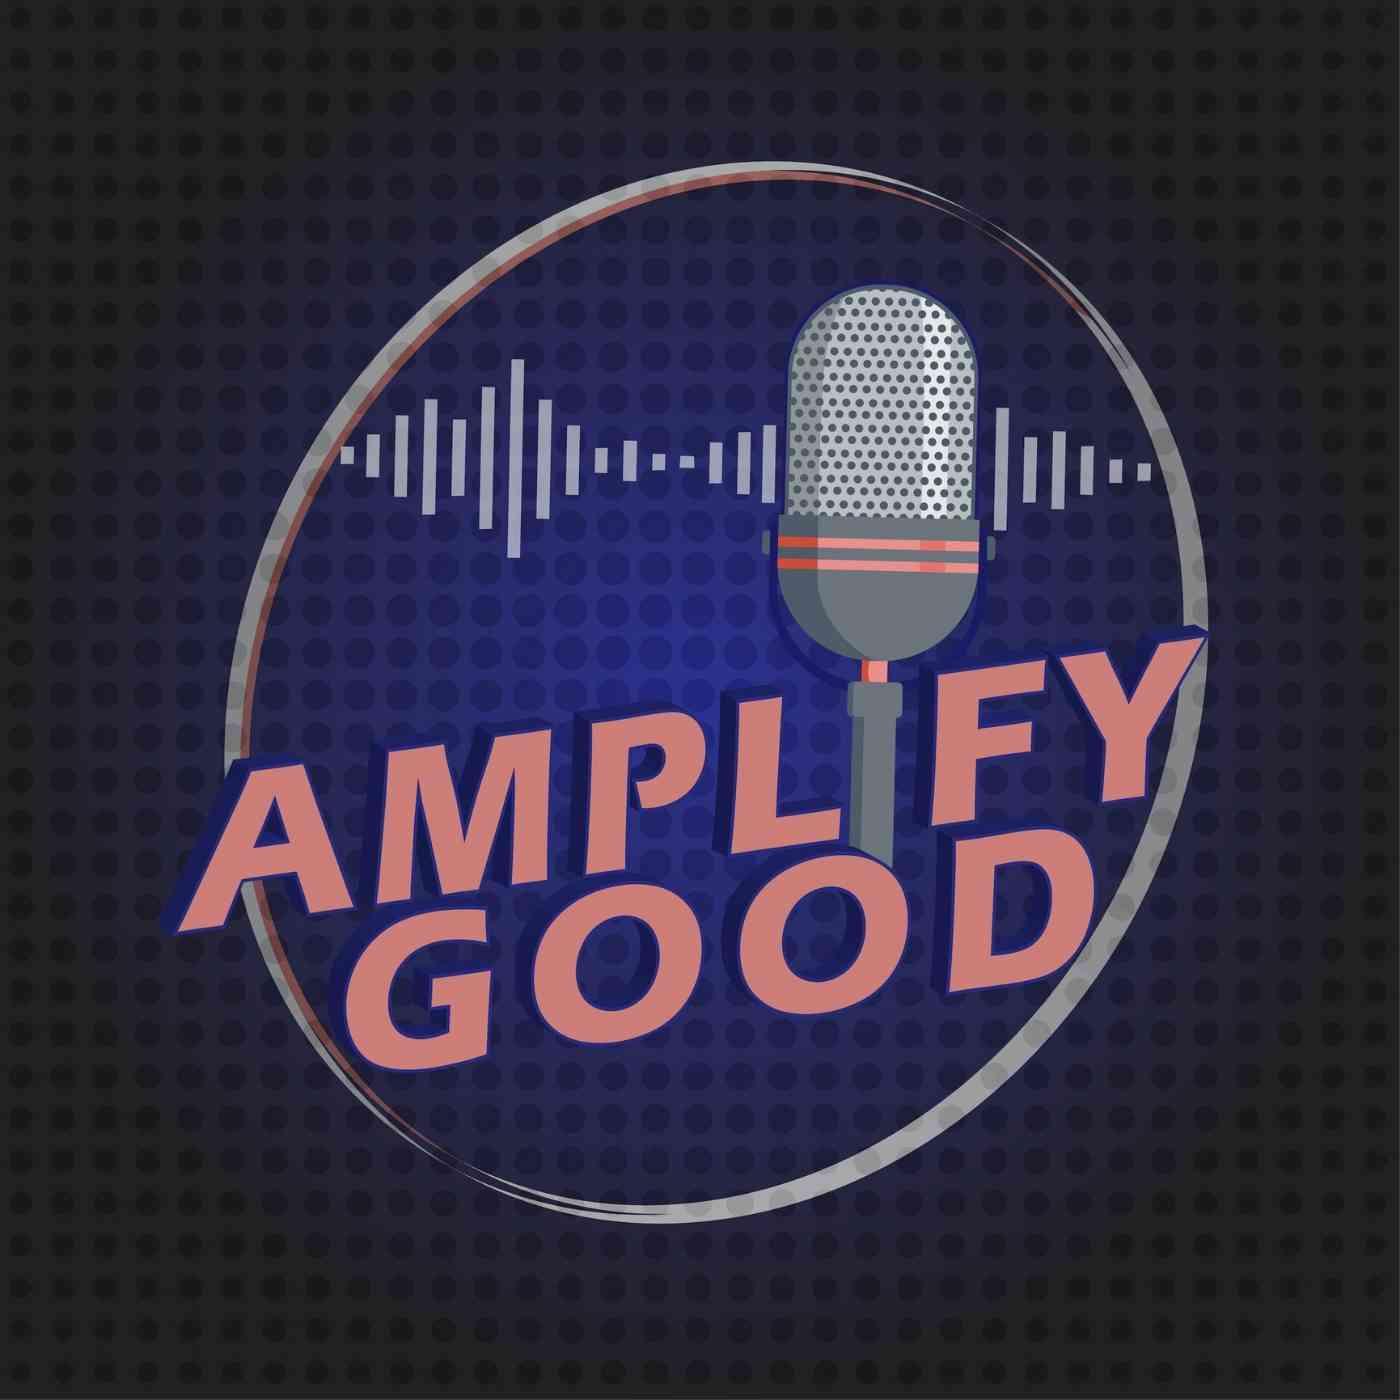 Amplify Good